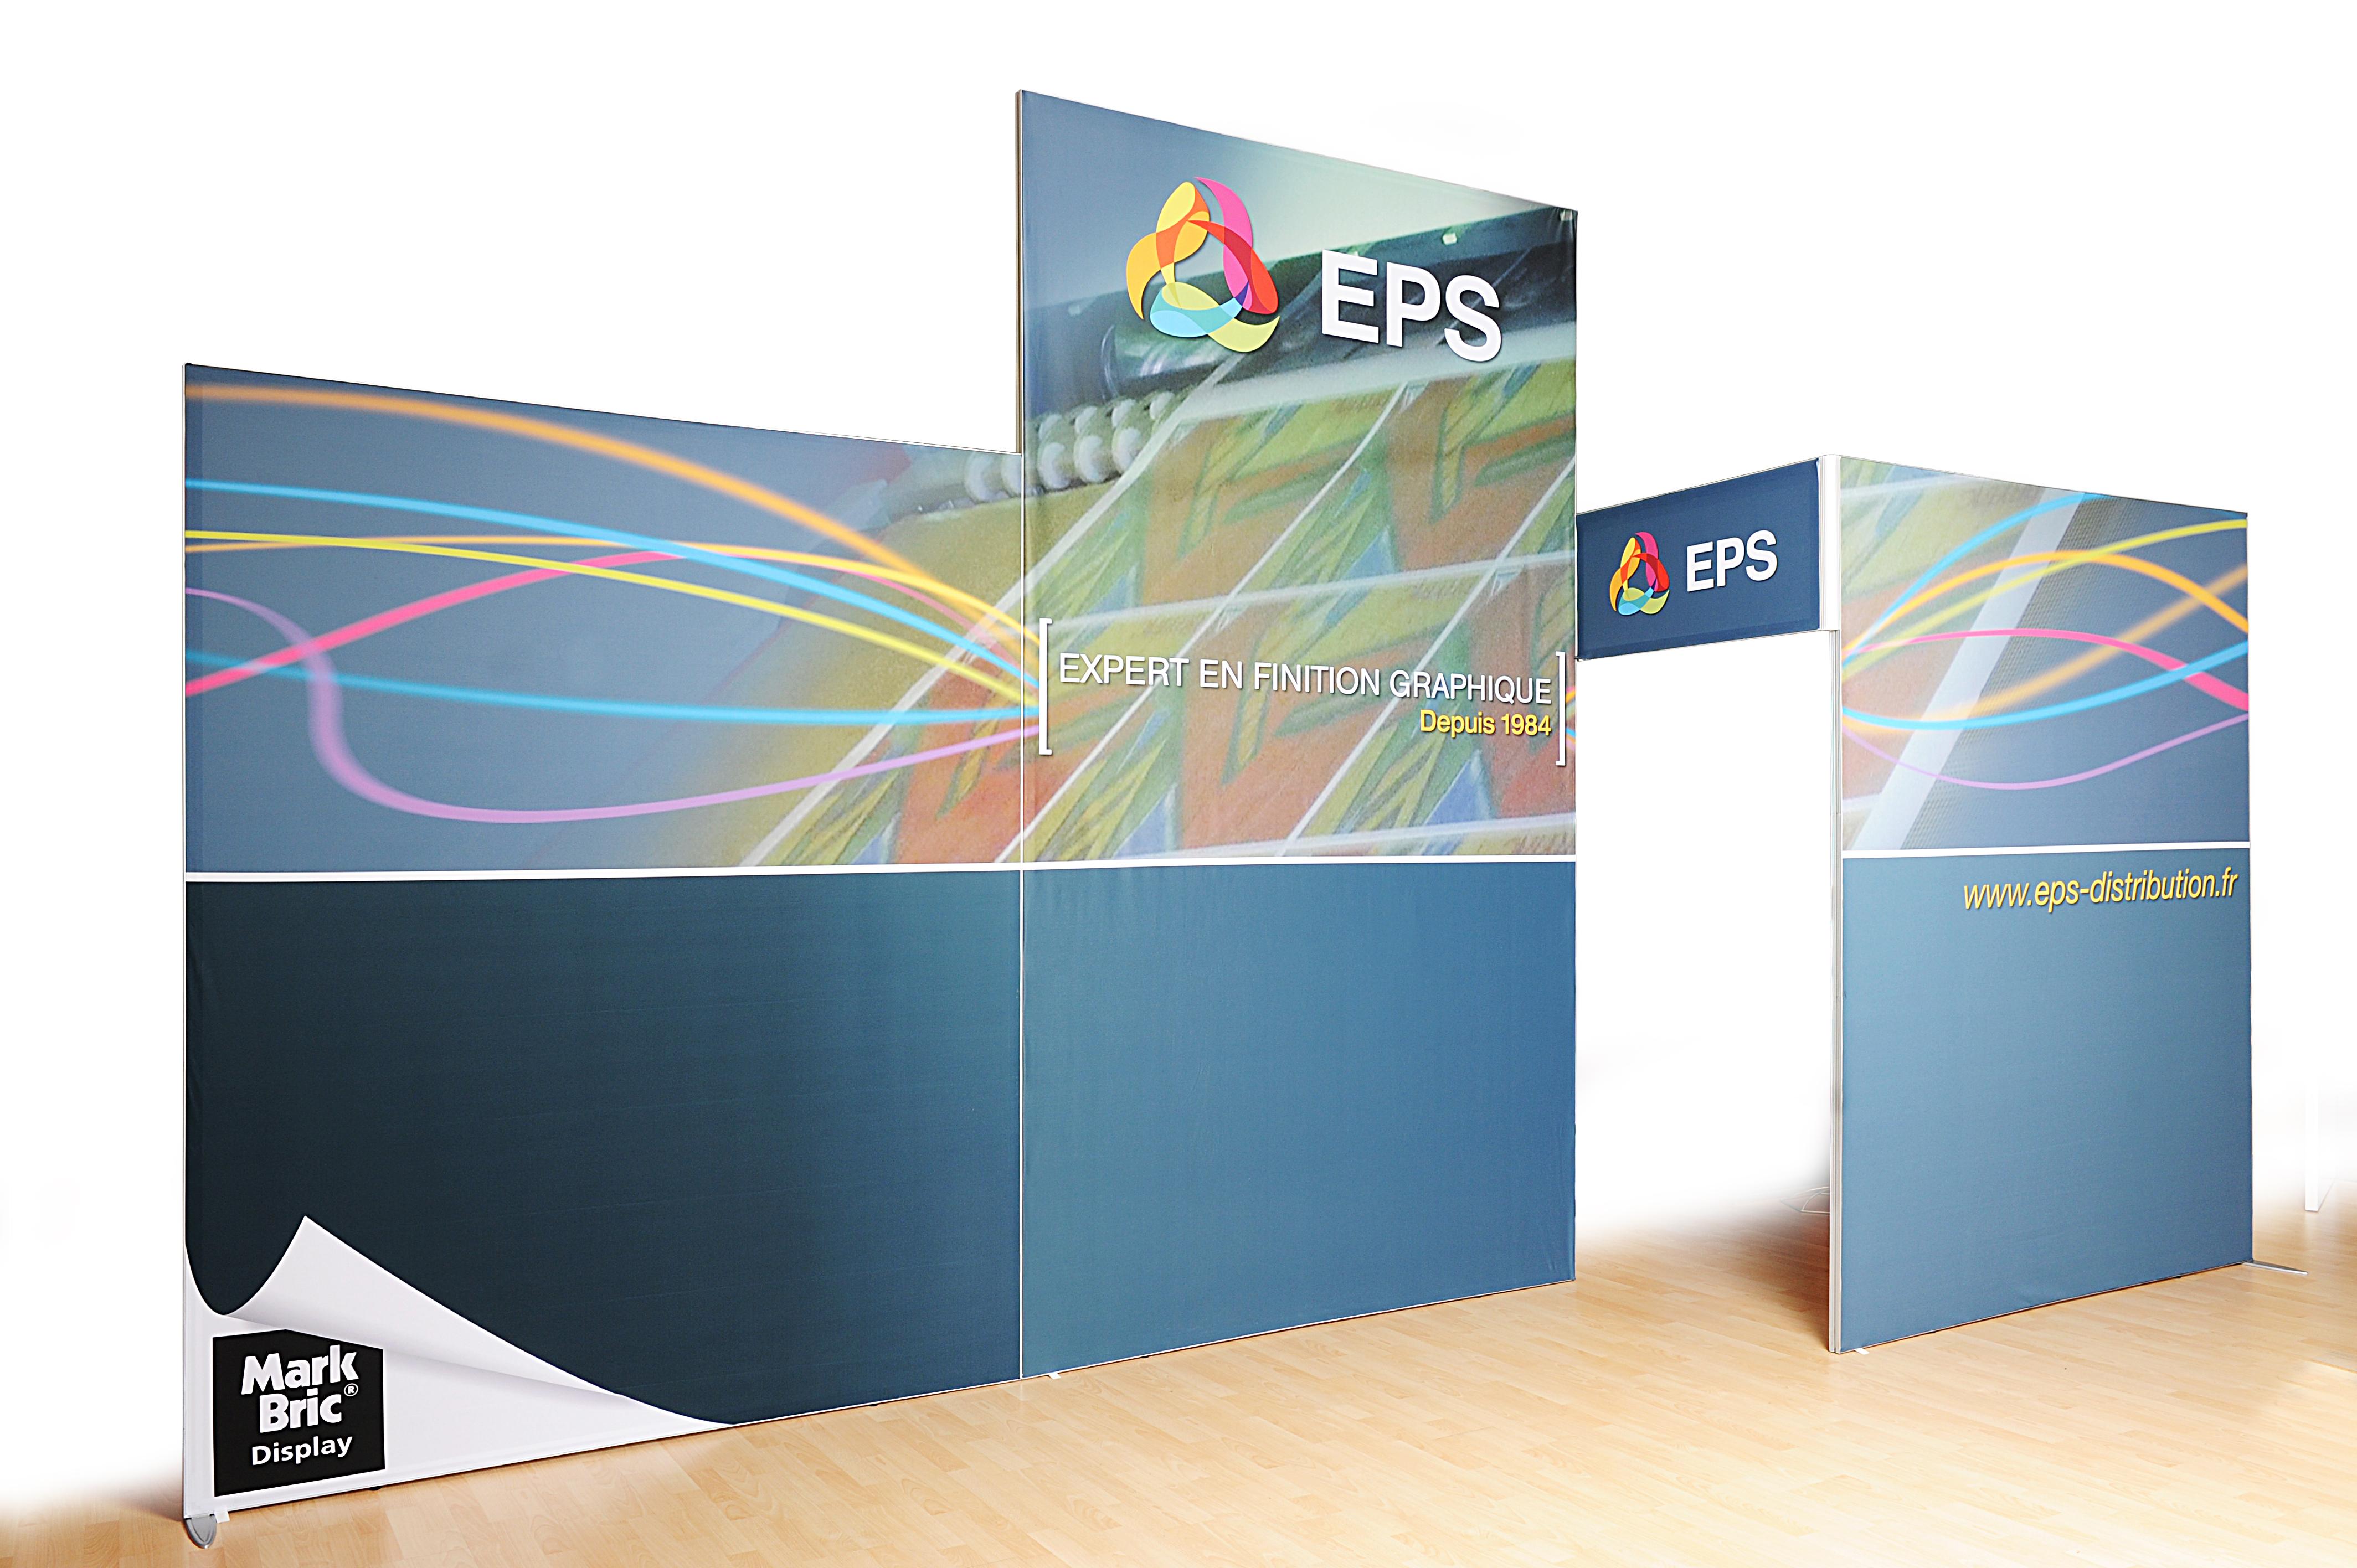 EPS Viscom stand isofram fabric textile